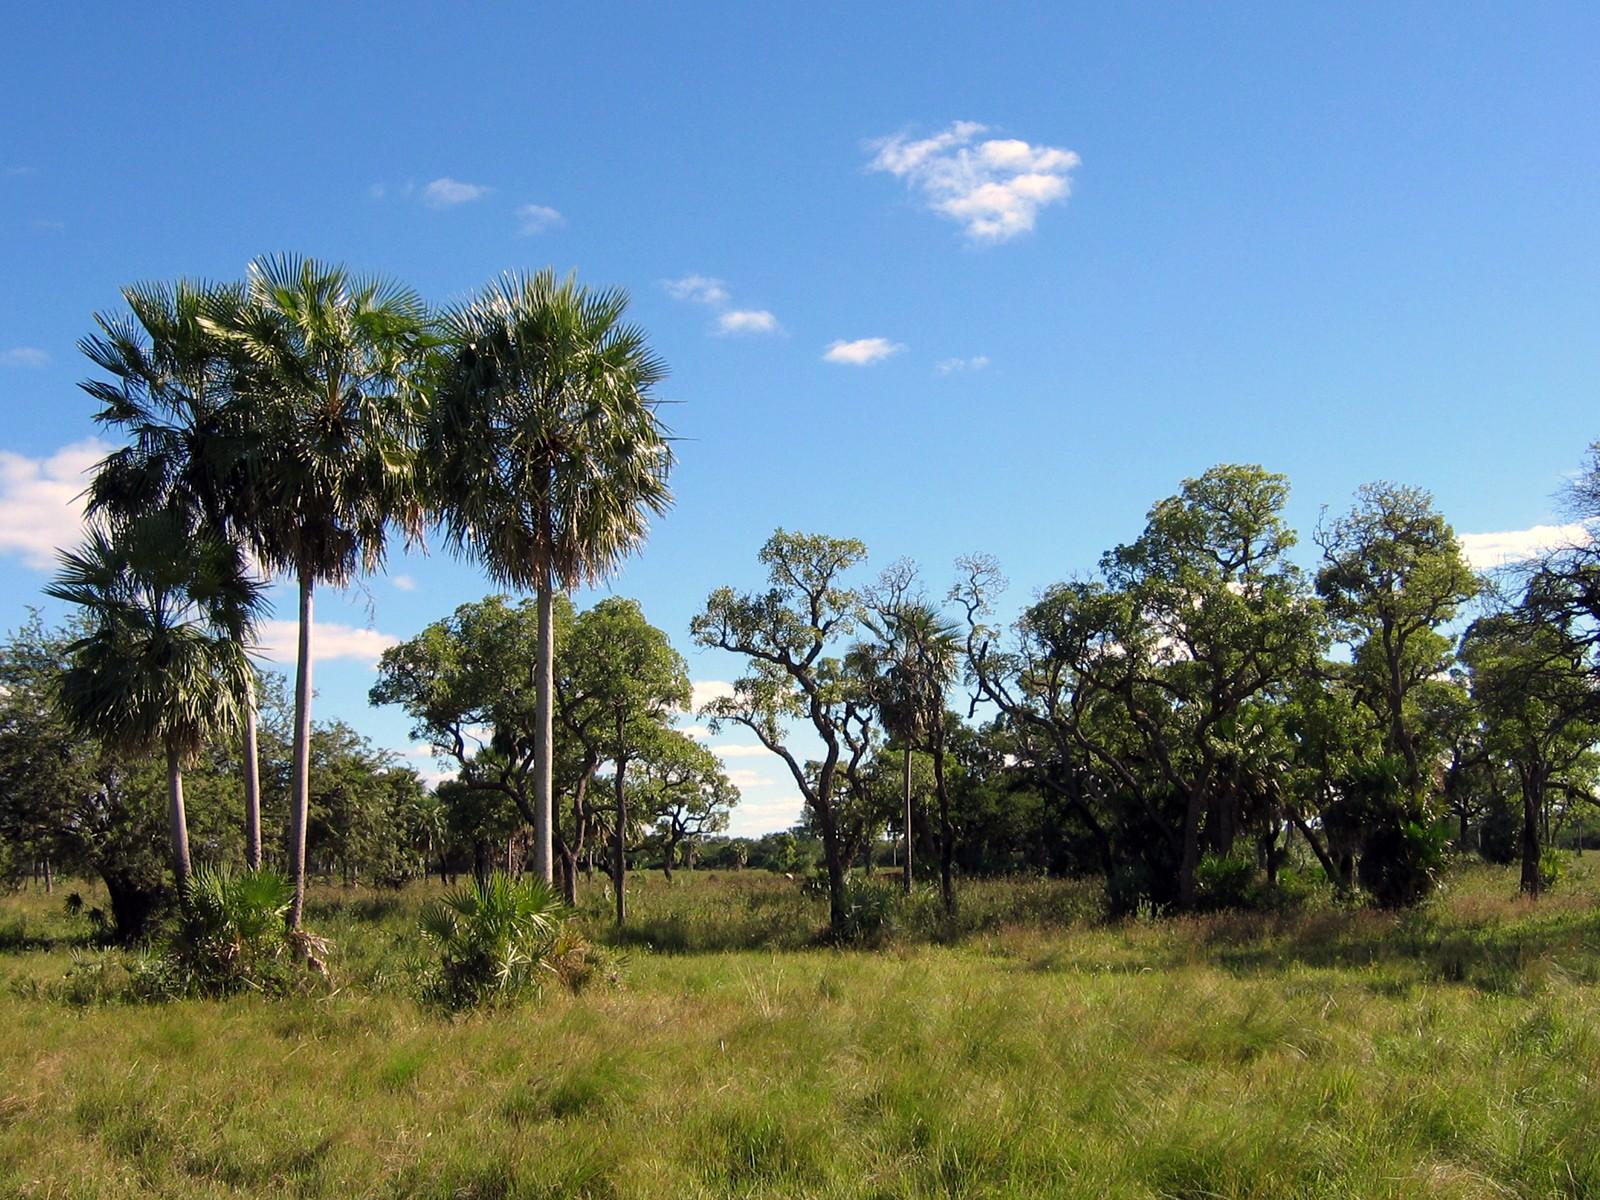 Ecorregiones Del Paraguay Pdf